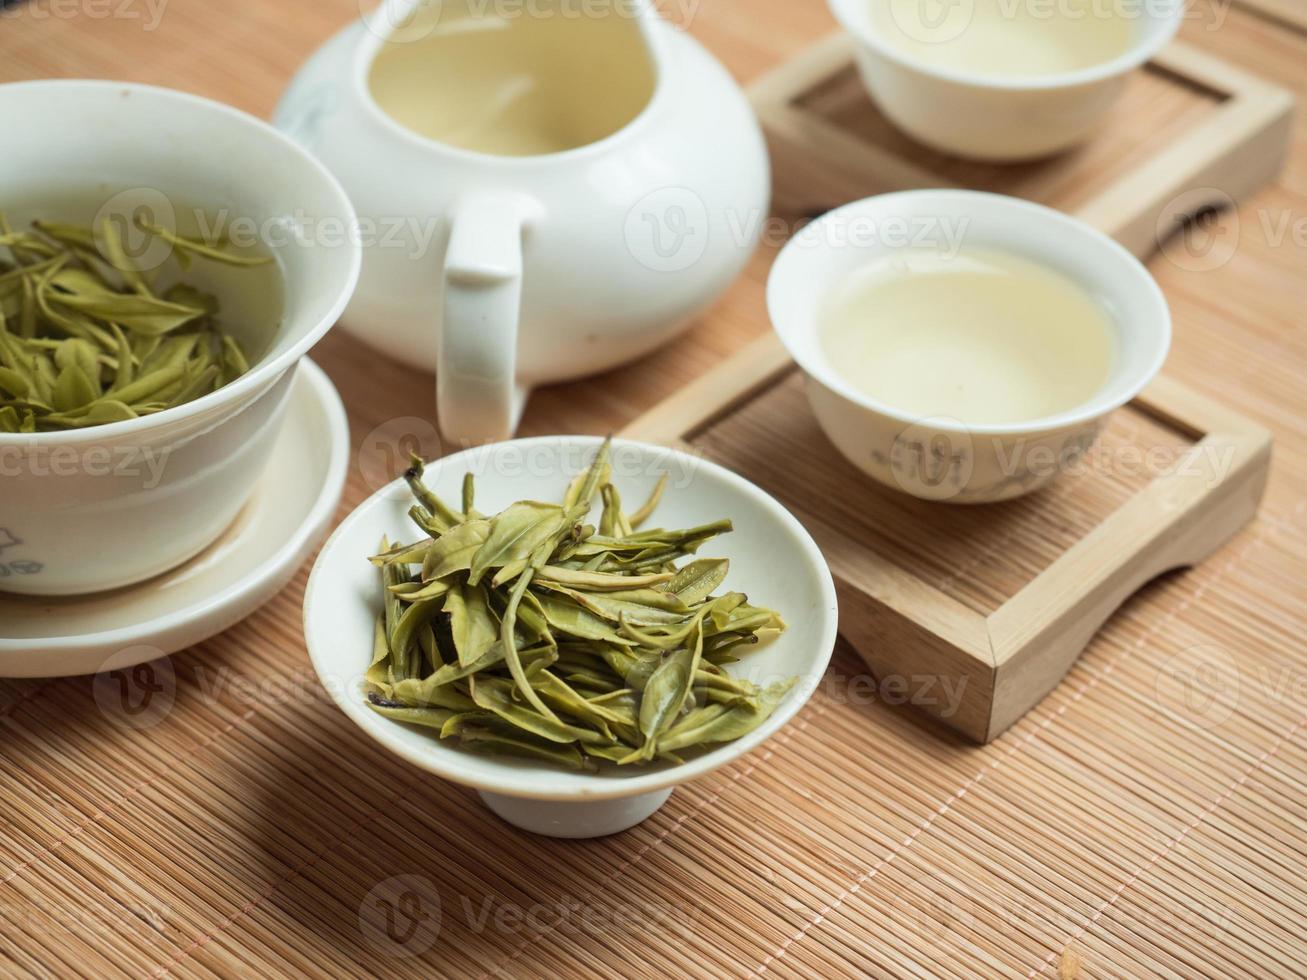 chinesisches Teeservice / grüner Teeservice foto